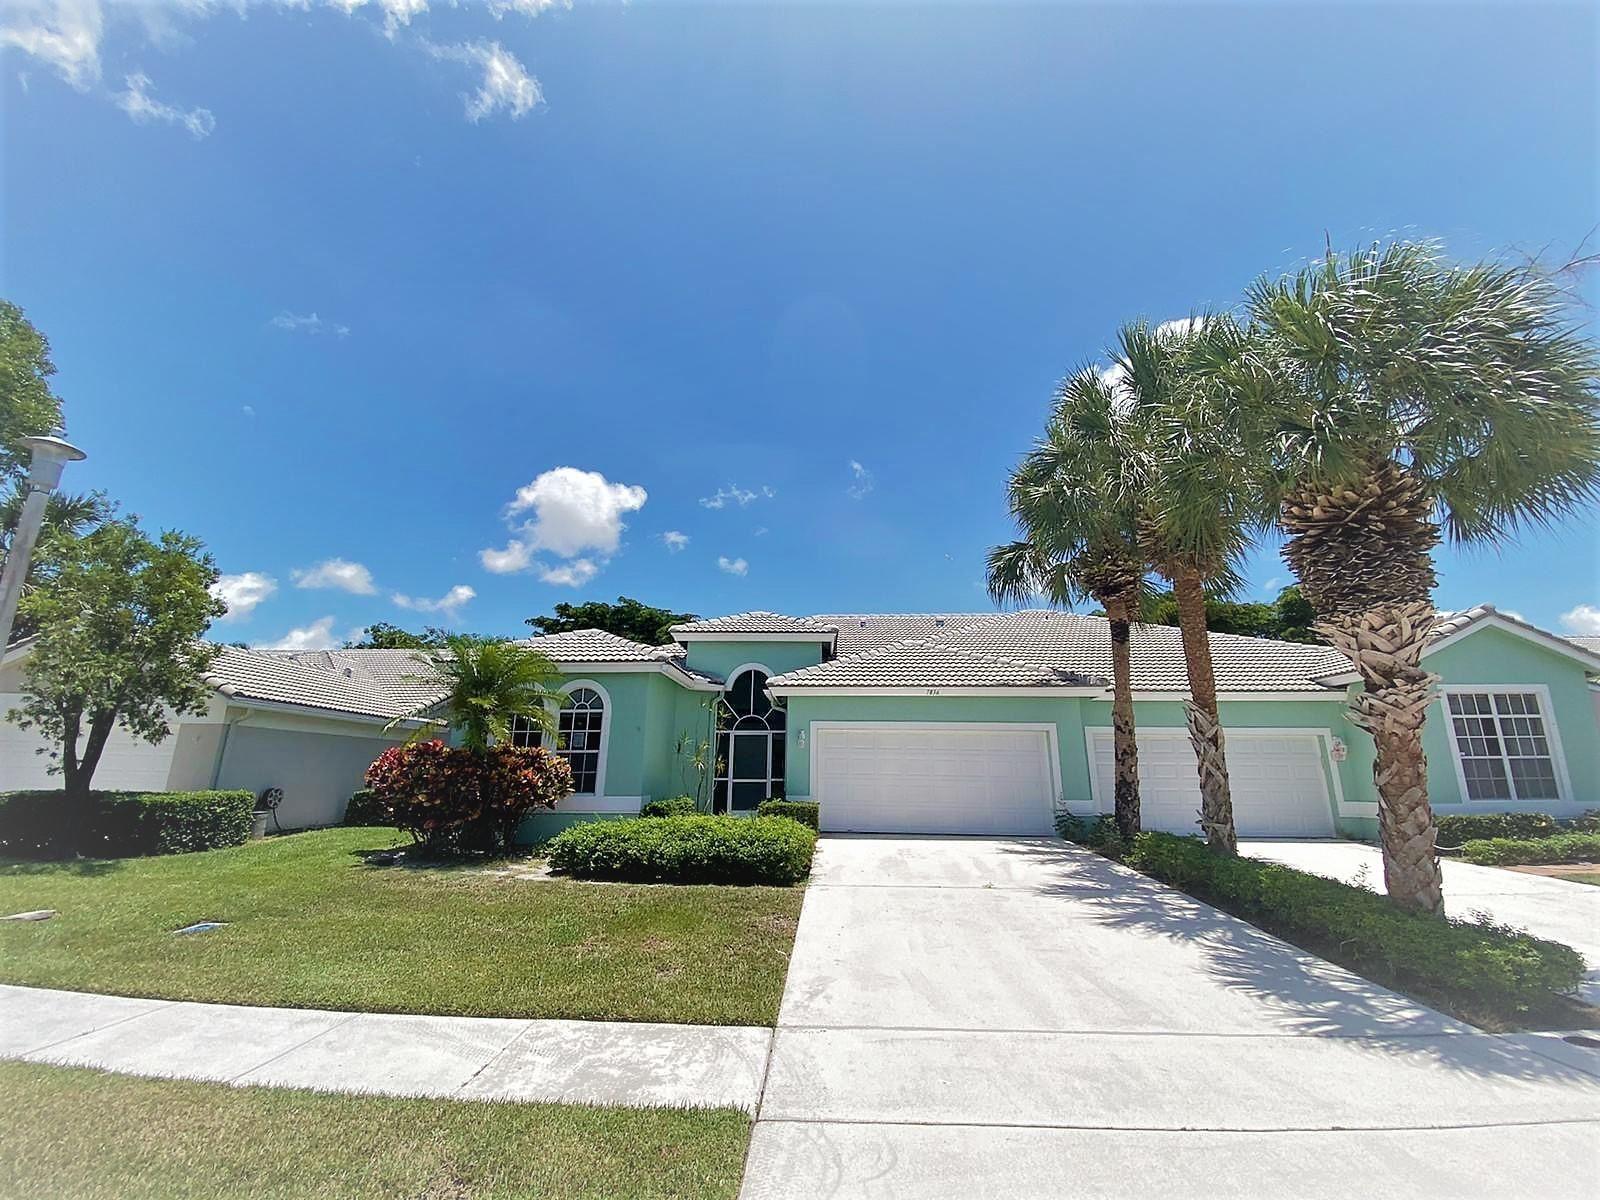 7836 Rockford Road, Boynton Beach, FL 33472 - #: RX-10634500